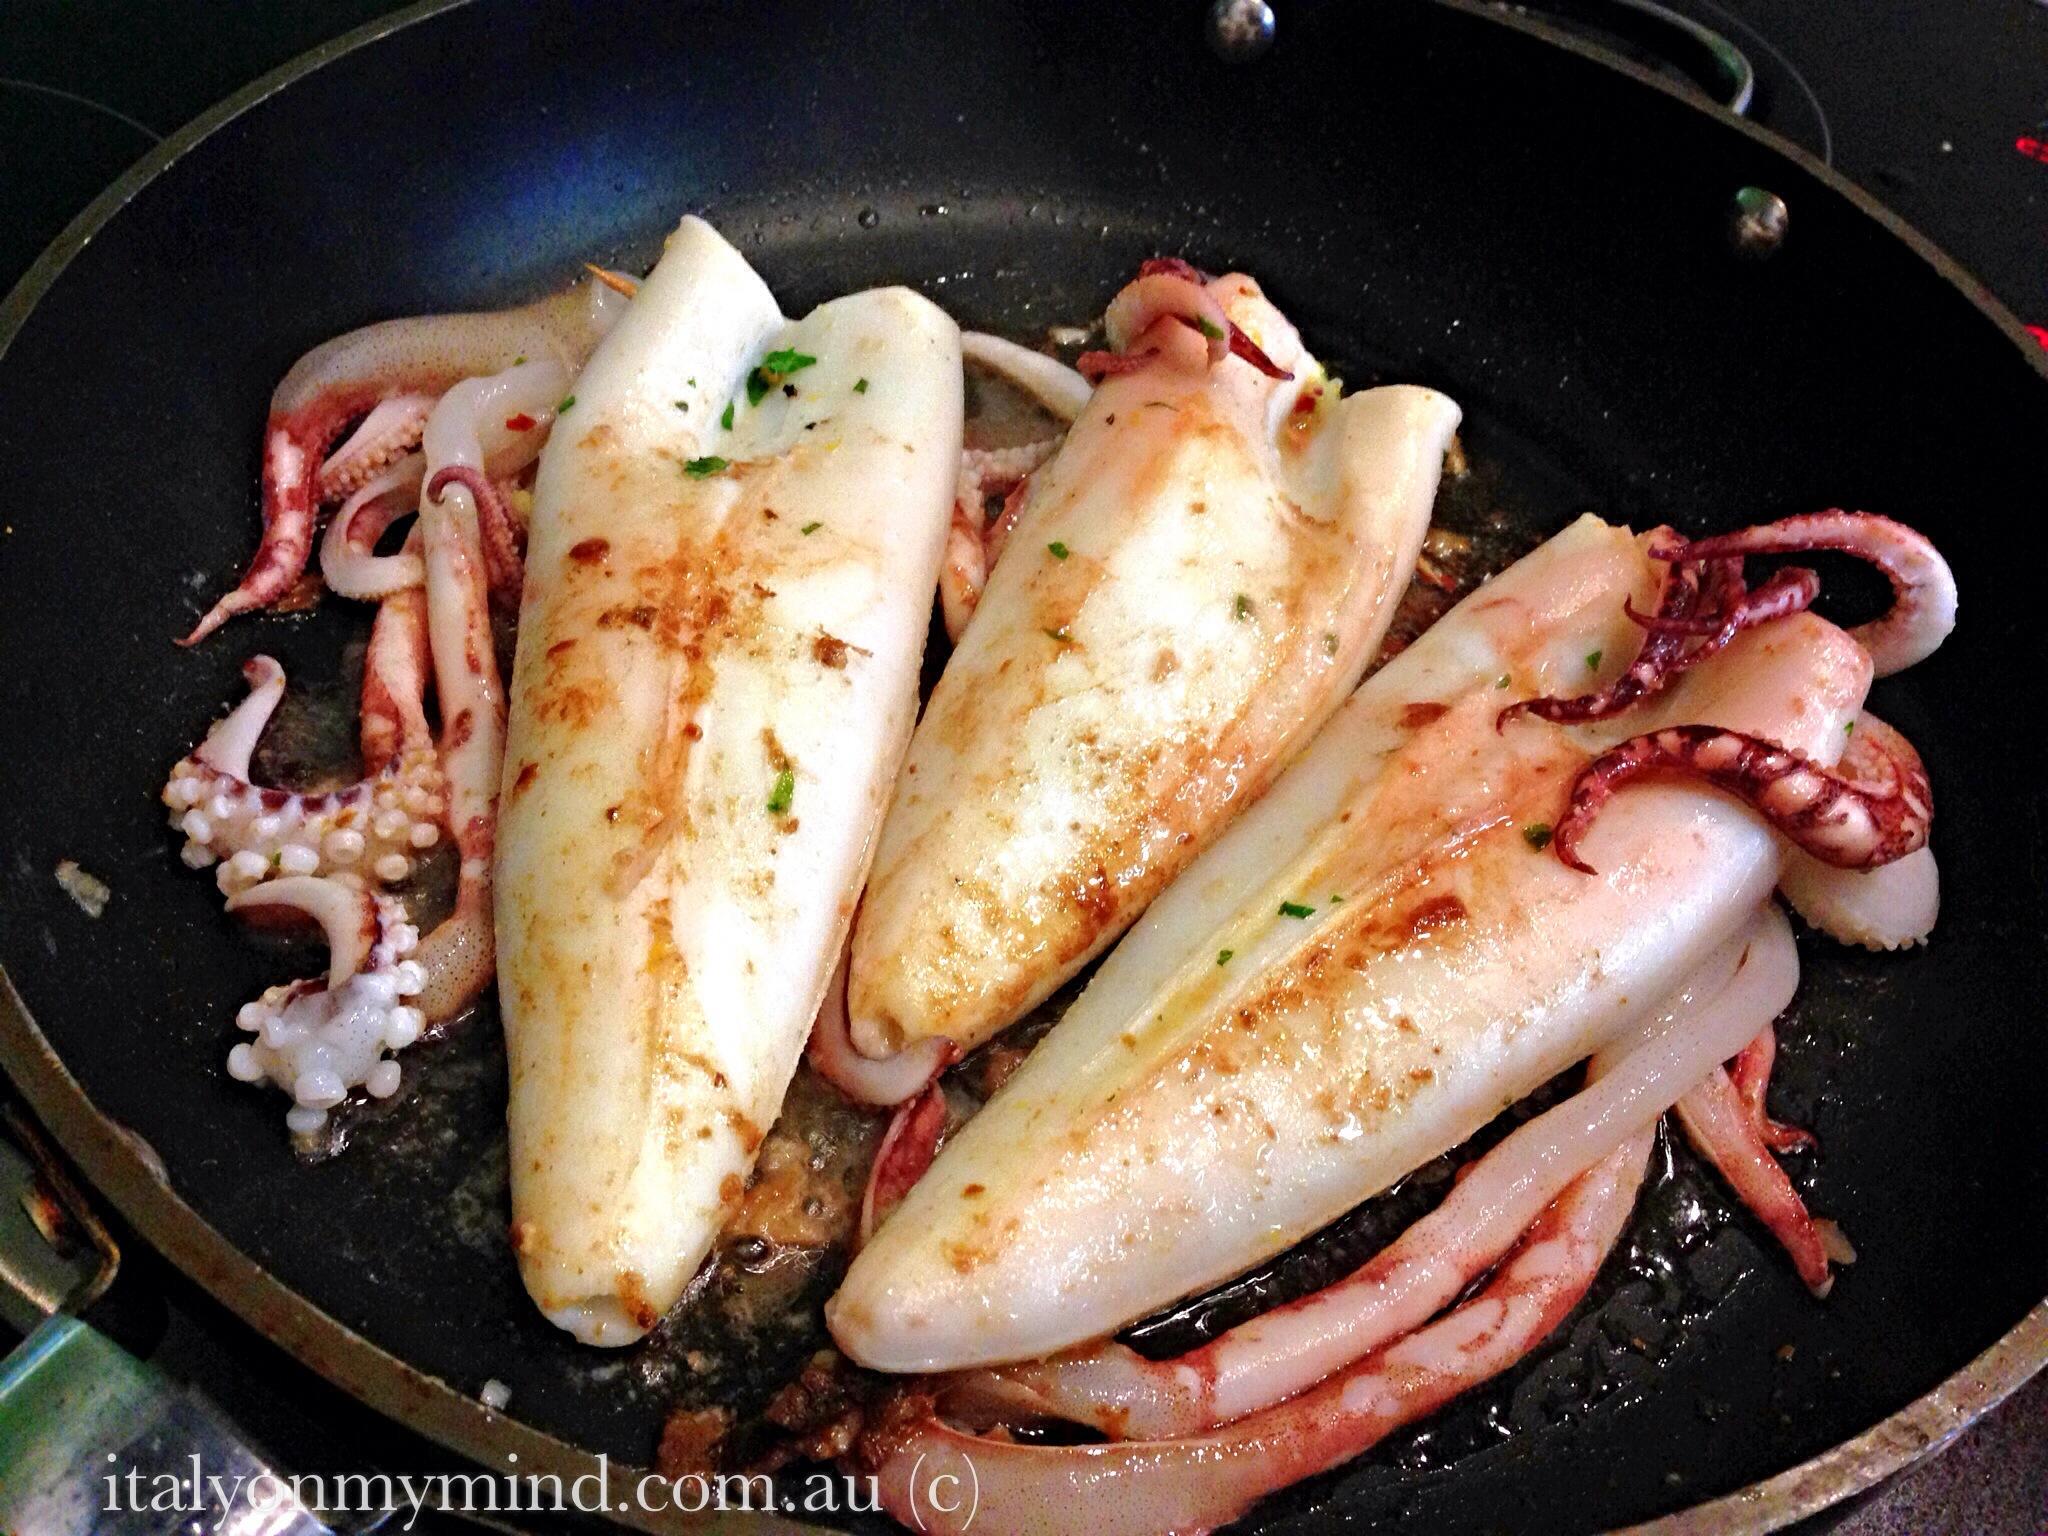 Stuffed squid with pancetta and fennel (calamari farciti)